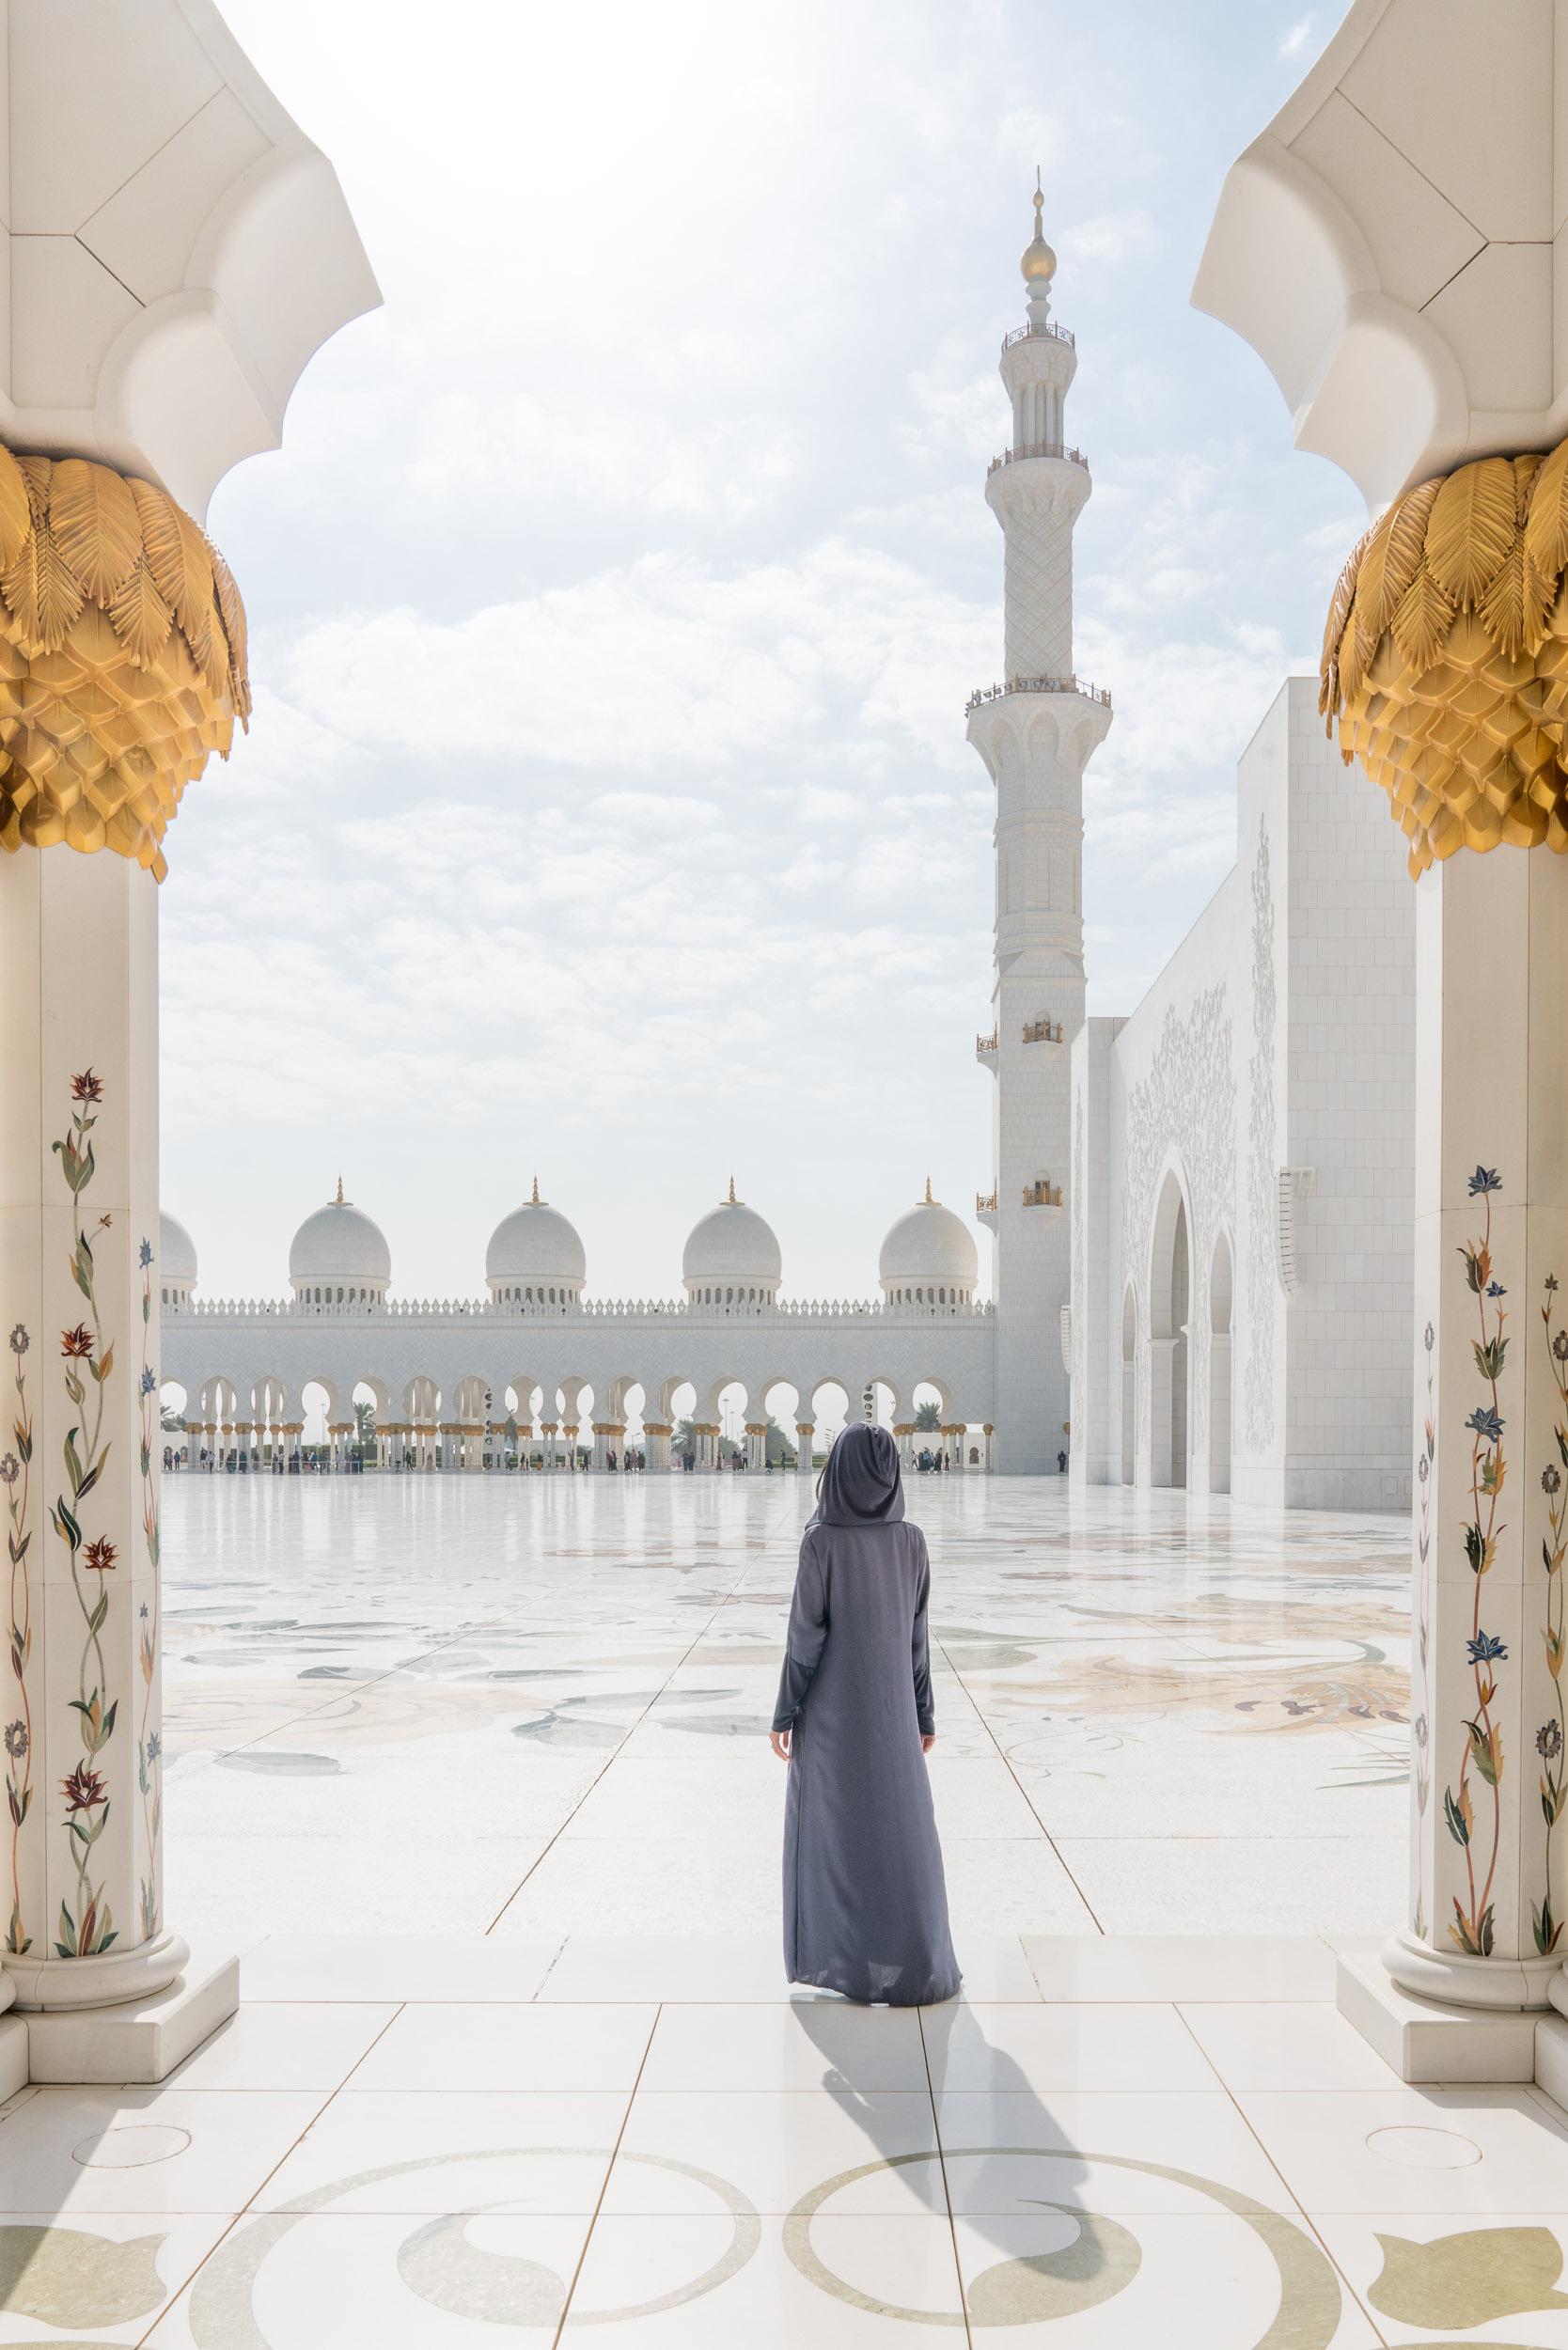 the_getaway_edit_abu_dhabi_sheikh_zayed_grand_mosque-8.jpg